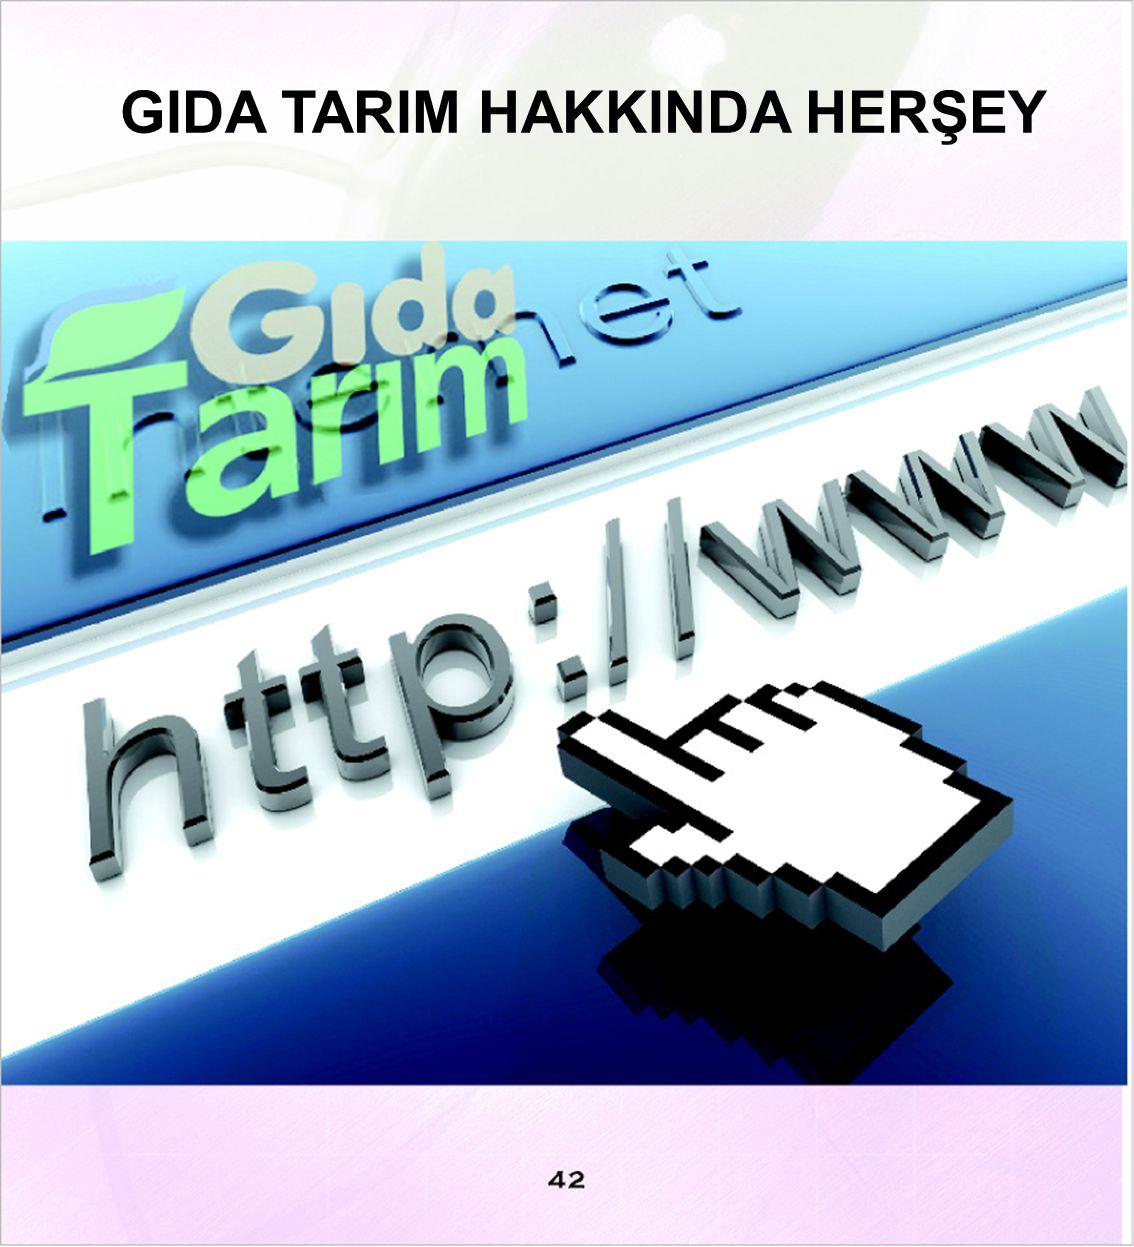 GIDA TARIM HAKKINDA HERŞEY